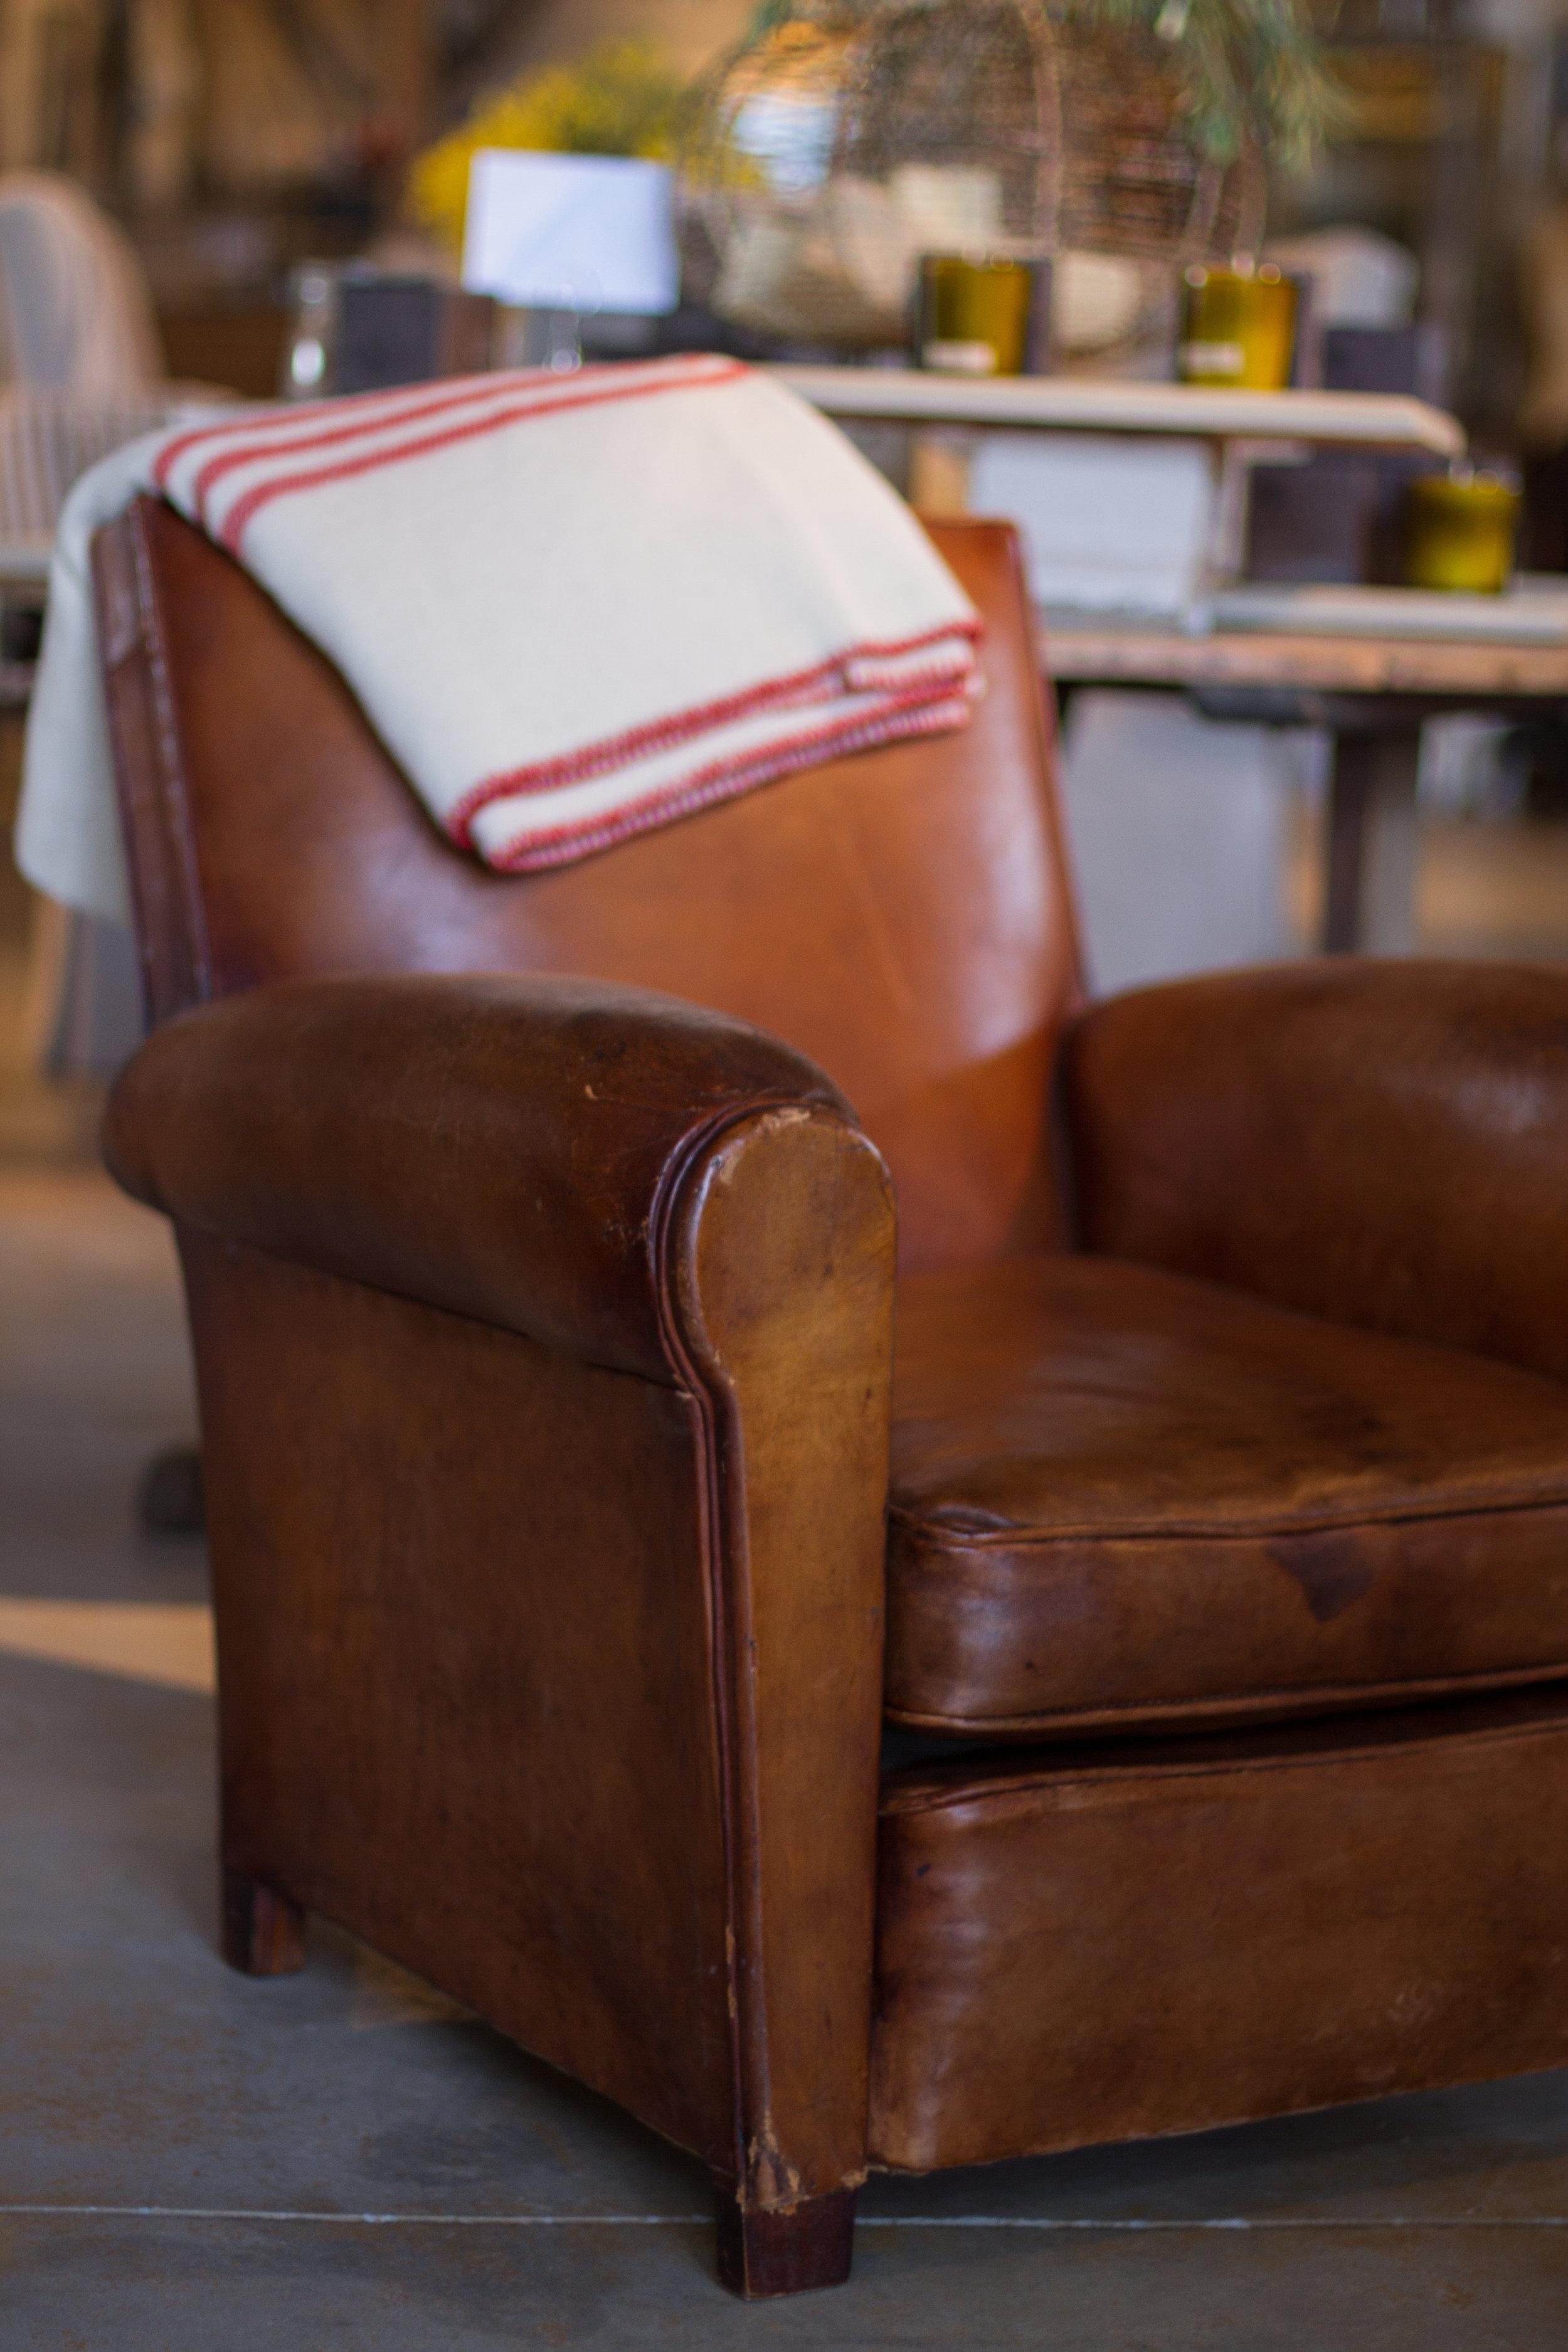 Prop Rentals Northern California | commercial, event rentals, lifestyle